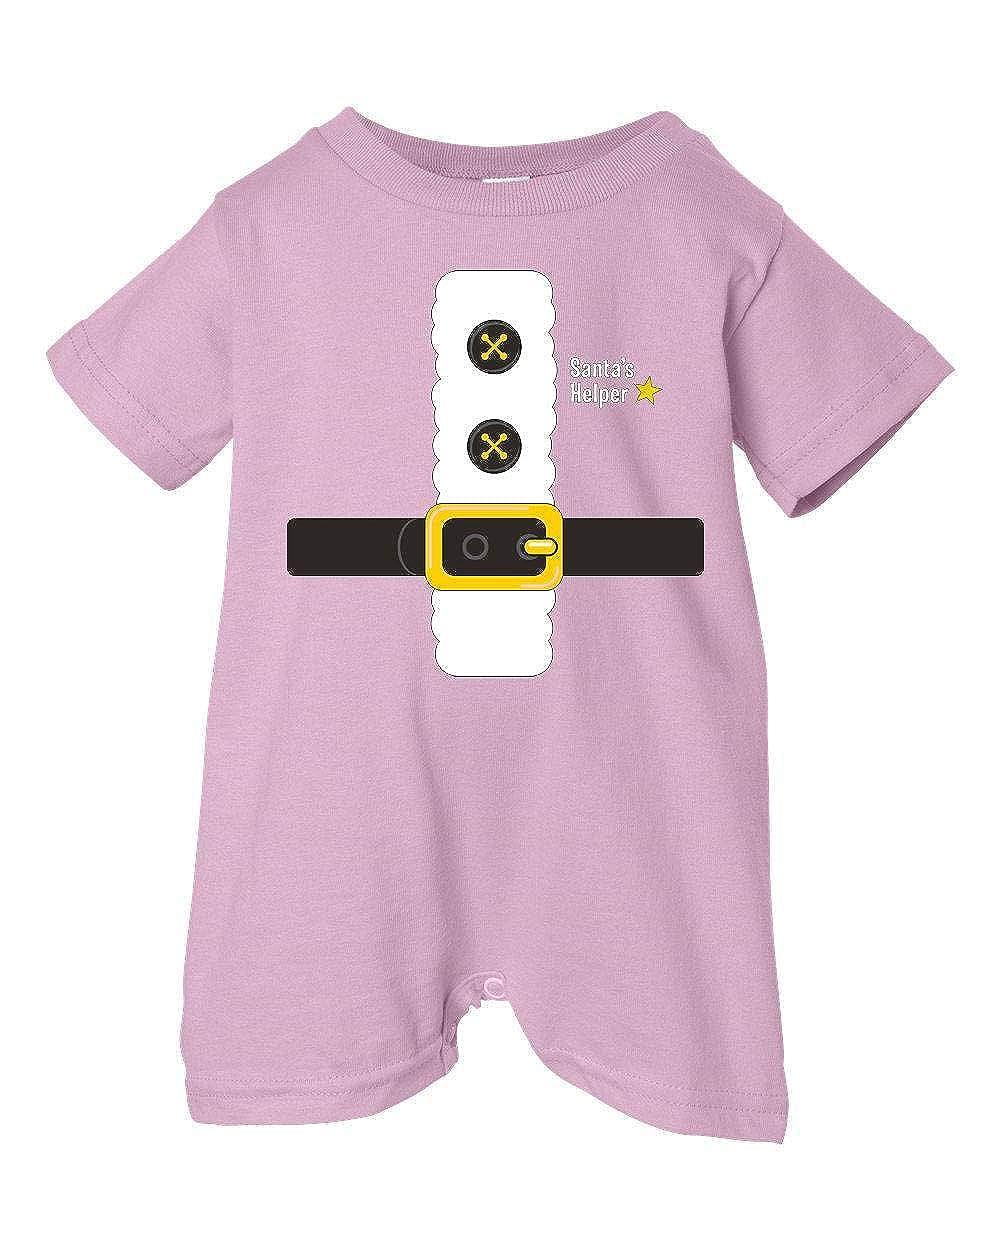 Pink, 24 Months Festive Threads Unisex Baby Christmas Santas Helper Outfit T-Shirt Romper